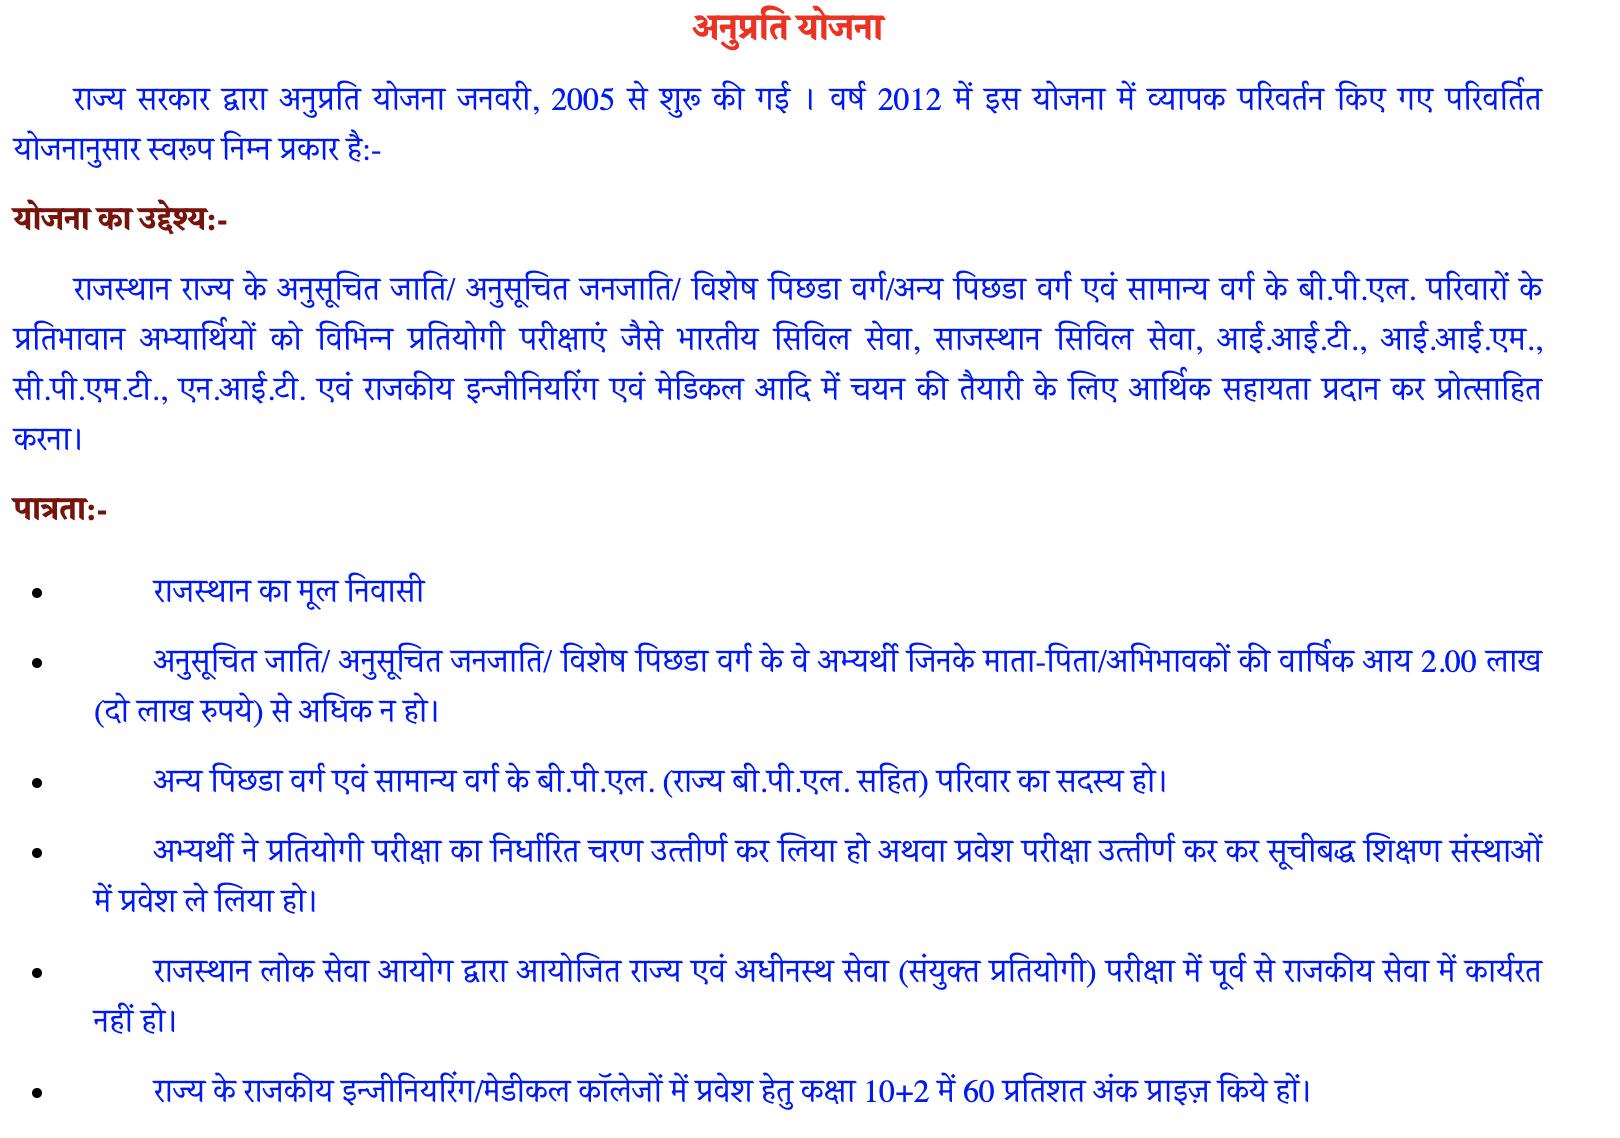 Rajasthan Anuprati Yojana apply